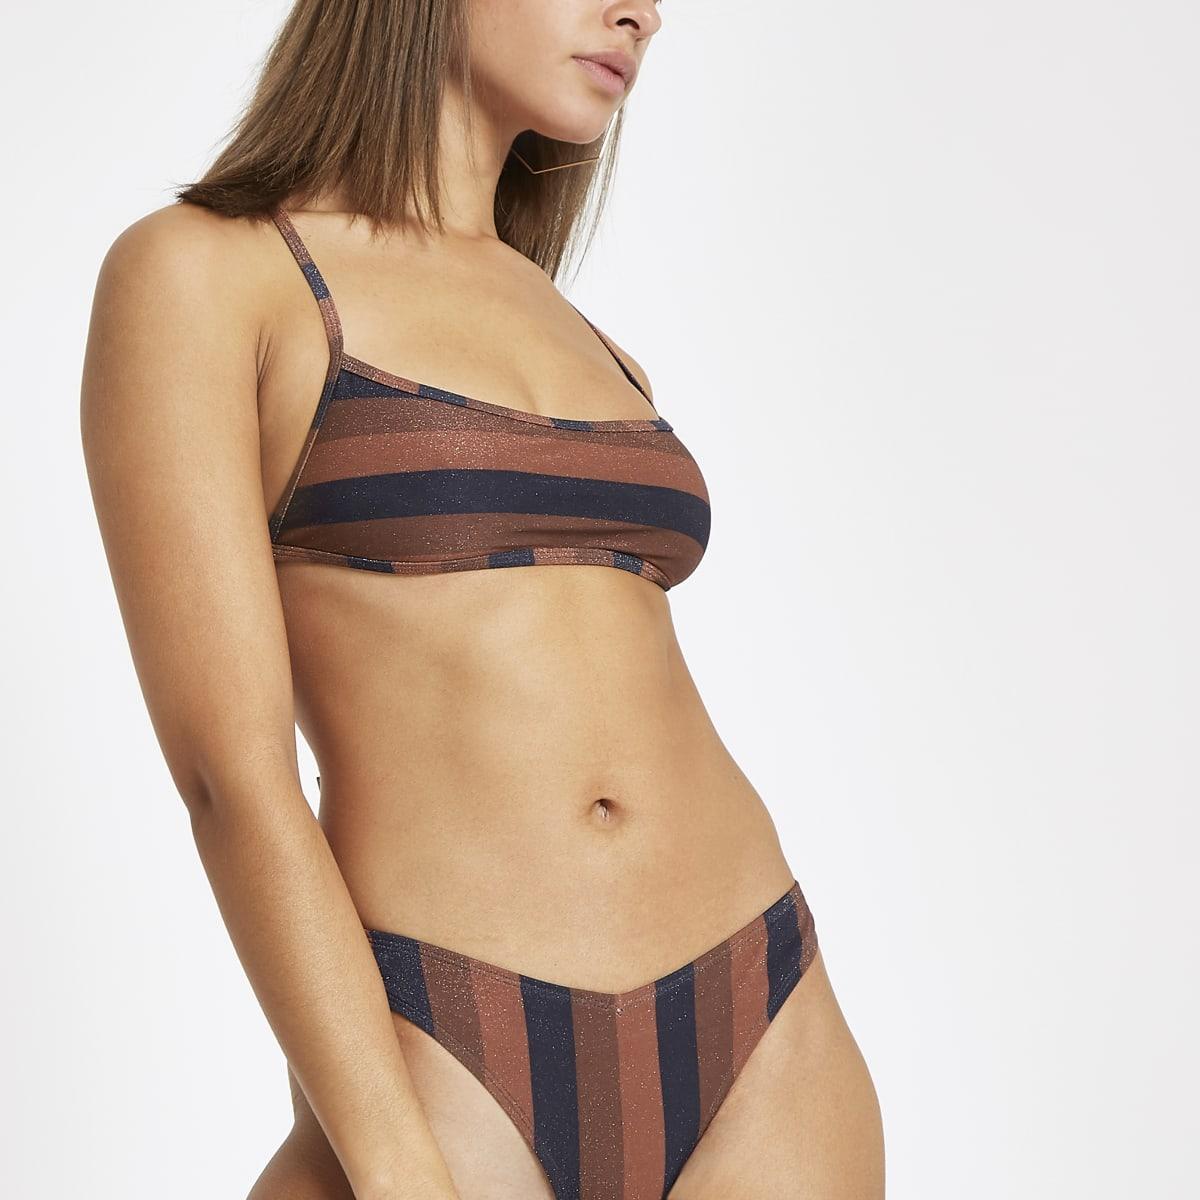 Bruine gestreepte bikinitop met gestrikte achterkant en vierkante hals